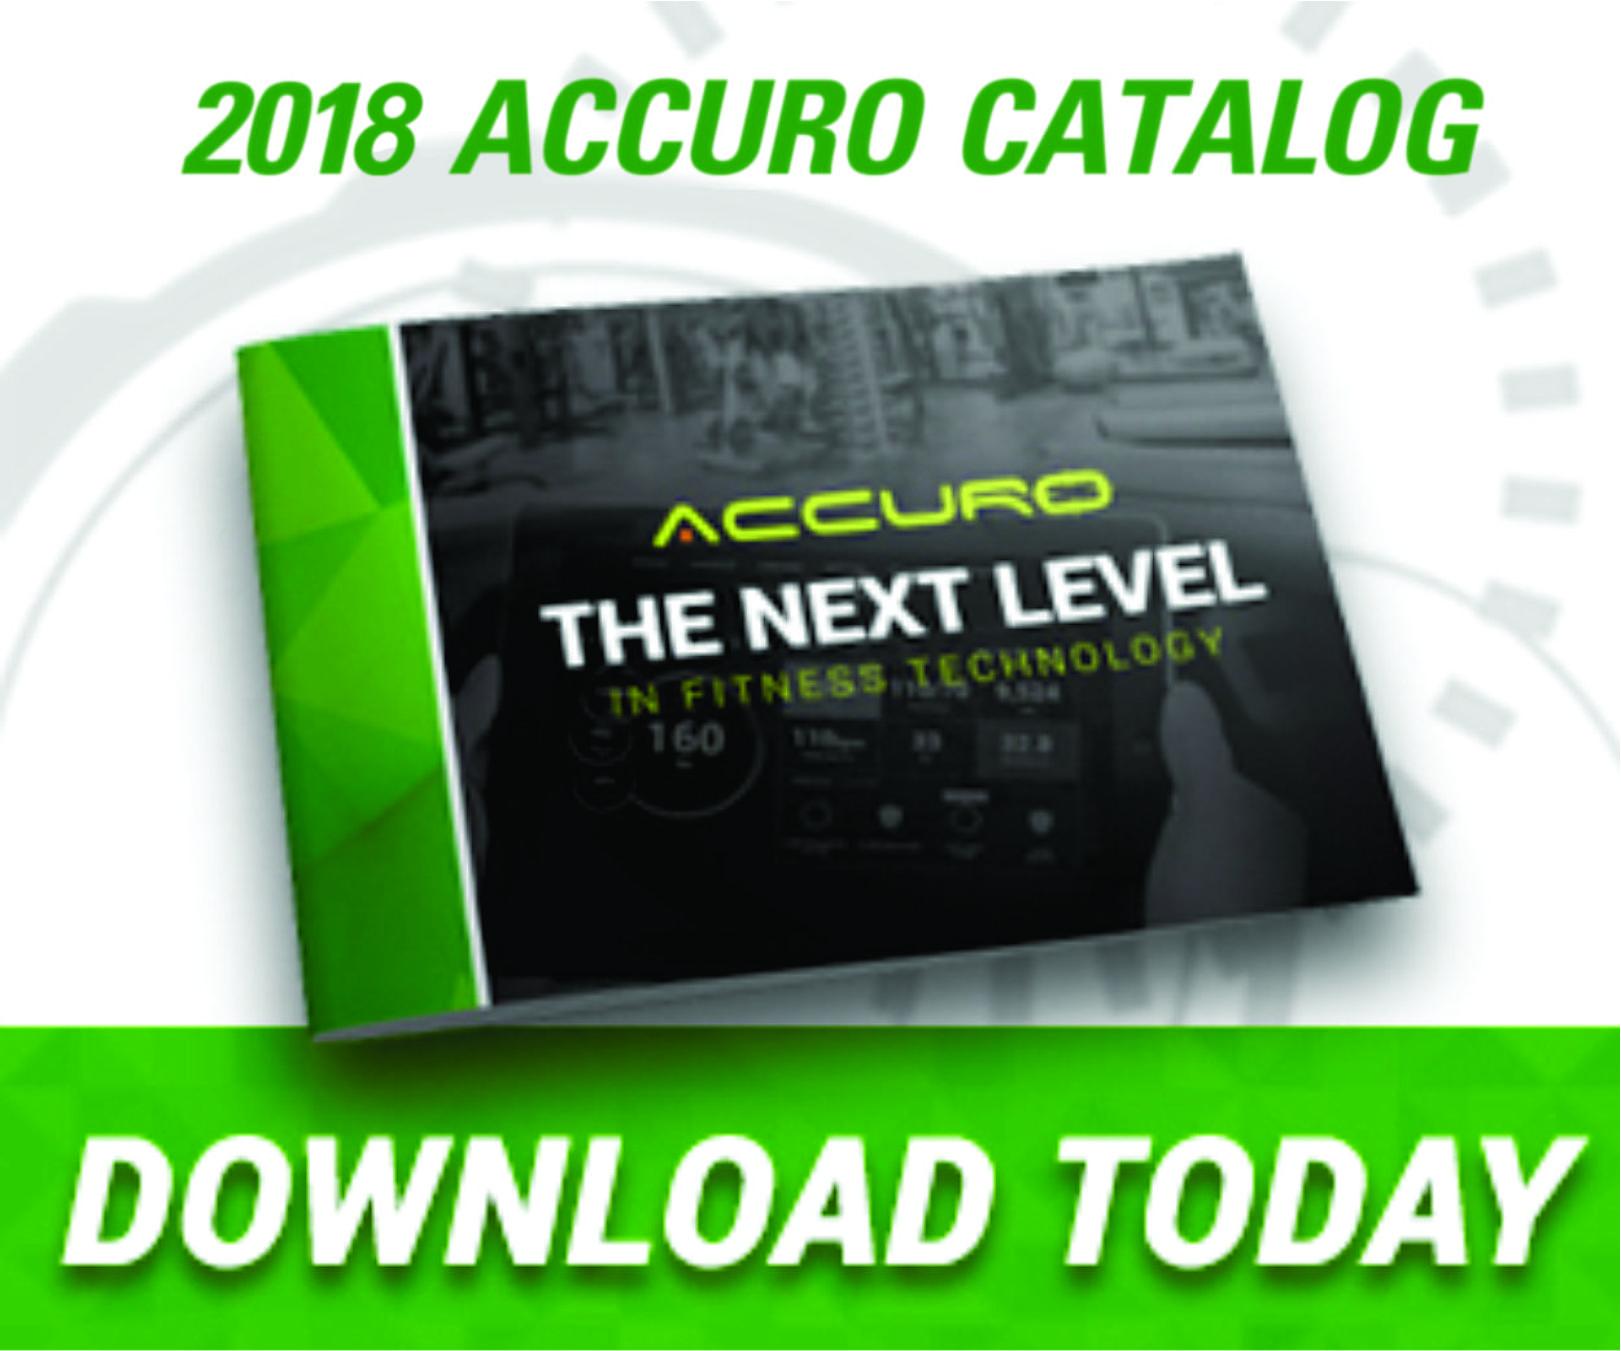 2018 Accuro Catalog